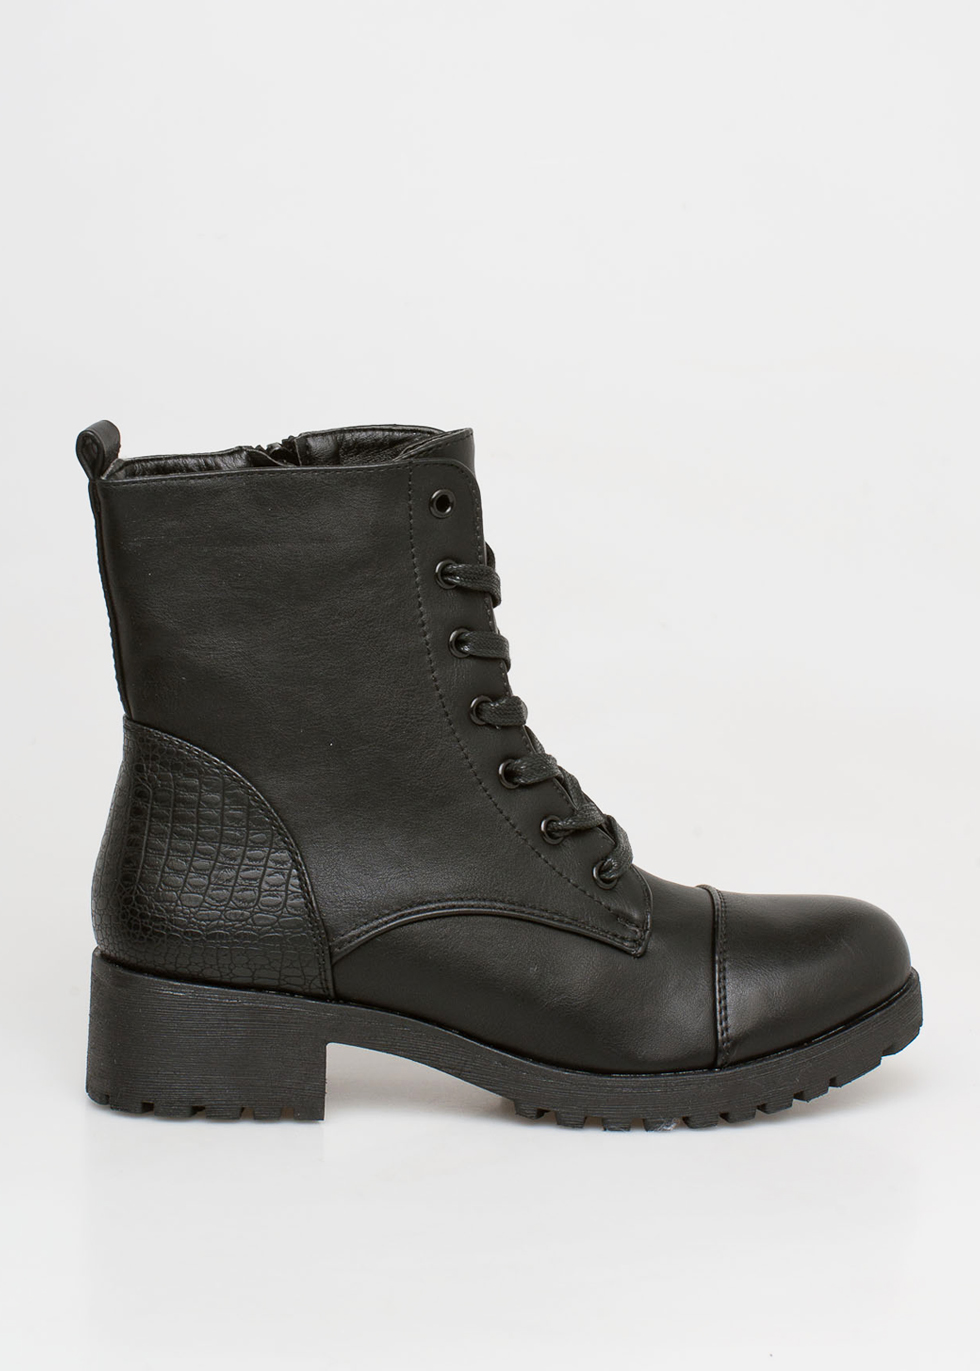 Carla lace boot, μαύρο μποτάκια